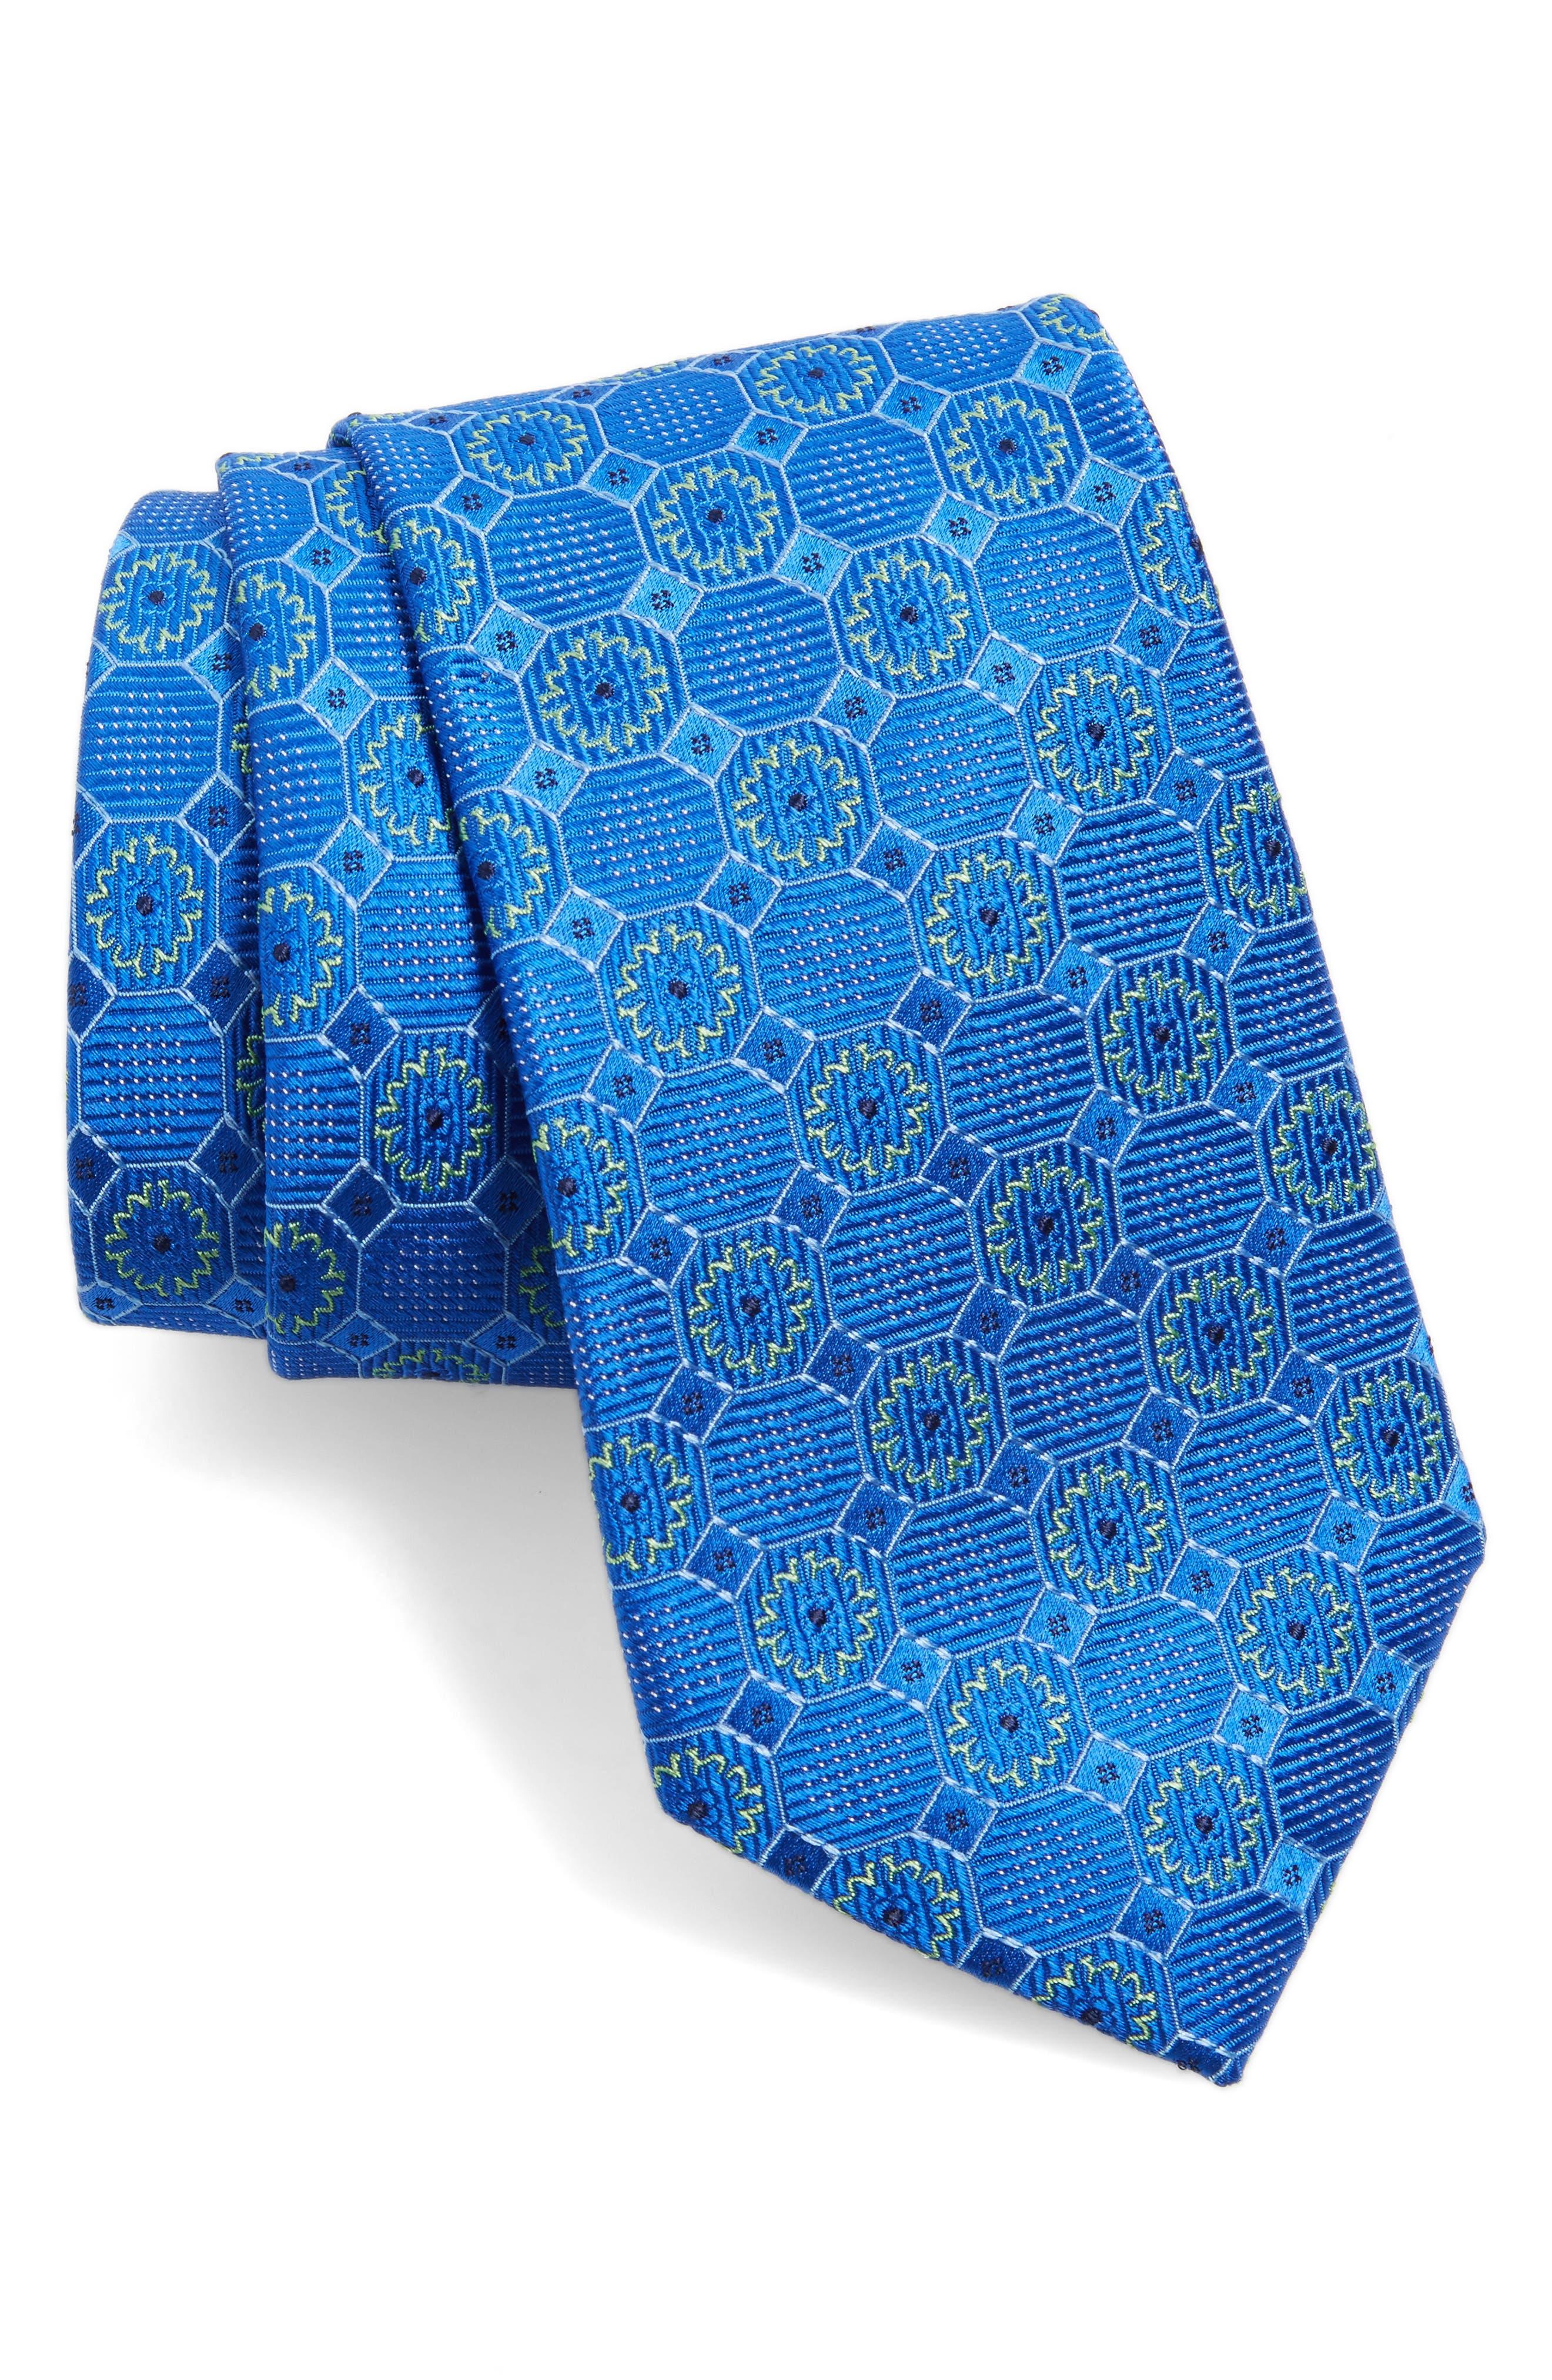 Alternate Image 1 Selected - Nordstrom Men's Shop Medallion Silk Tie